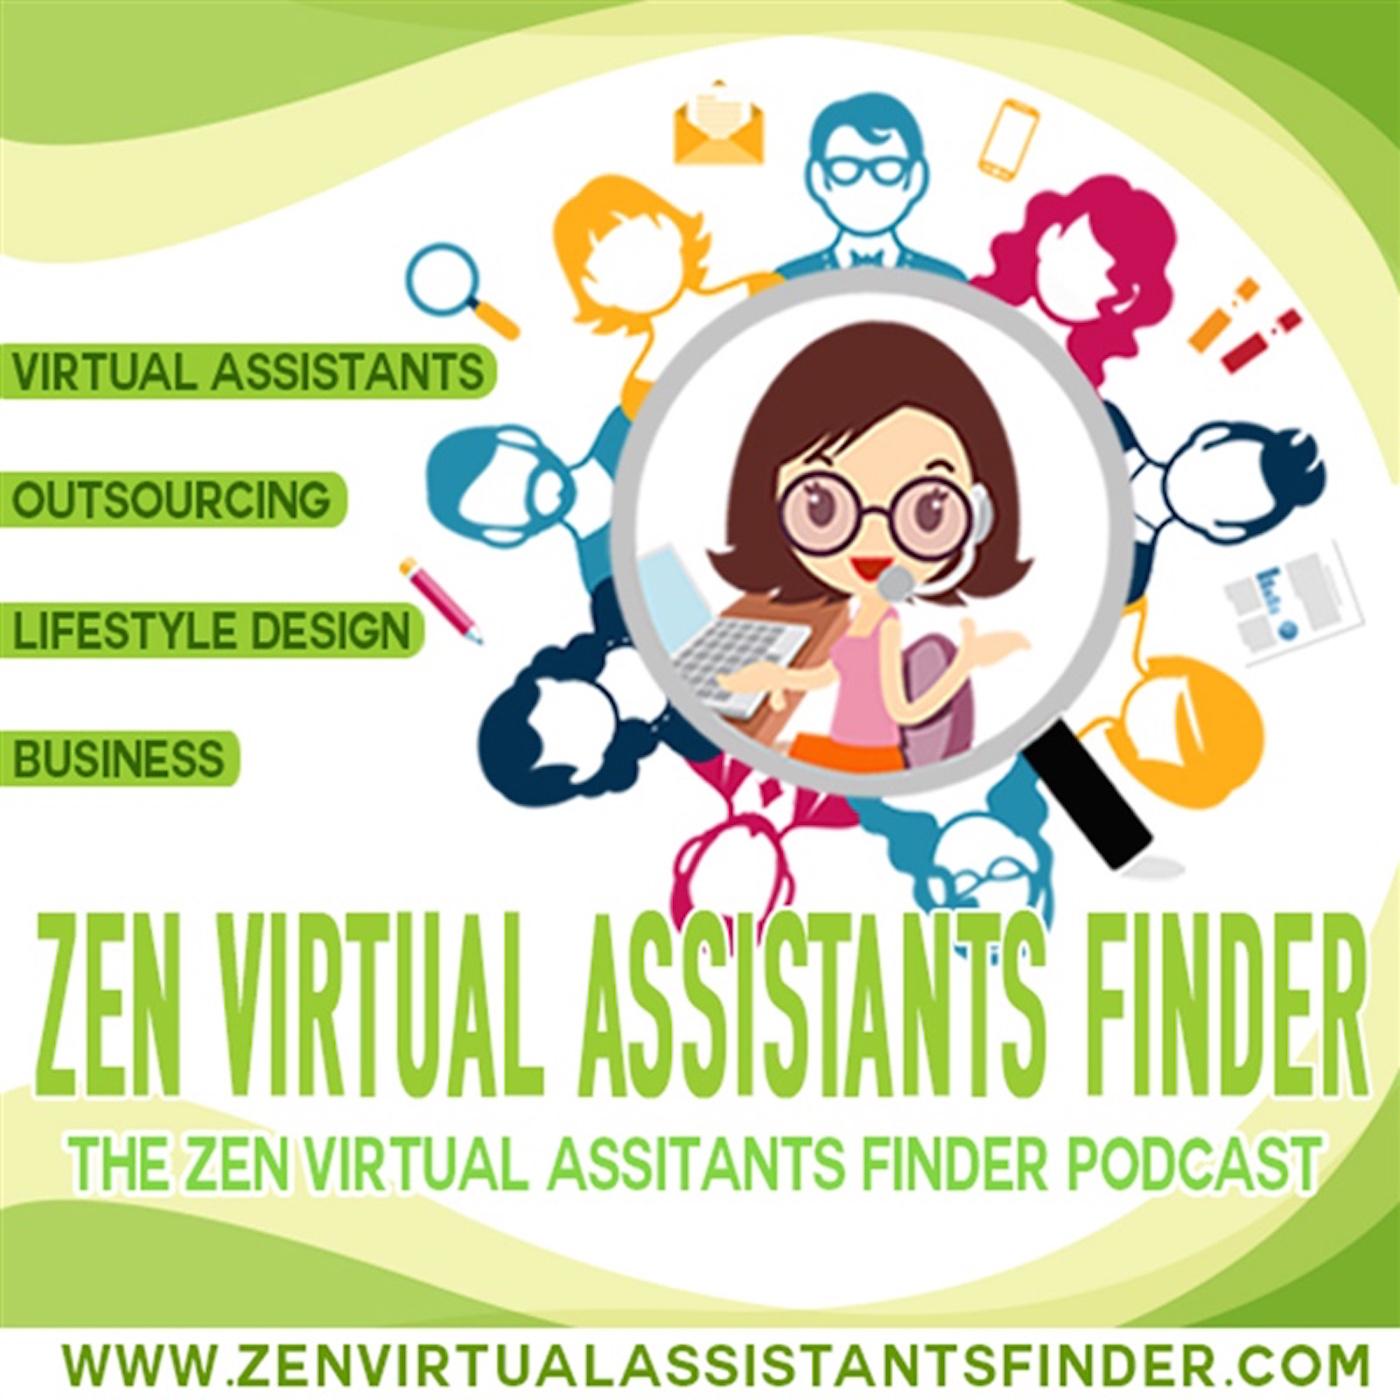 Zen Virtual Assistants Finder Podcast: Virtual Assistants | Outsourcing | LifeStyle Design | Business show art